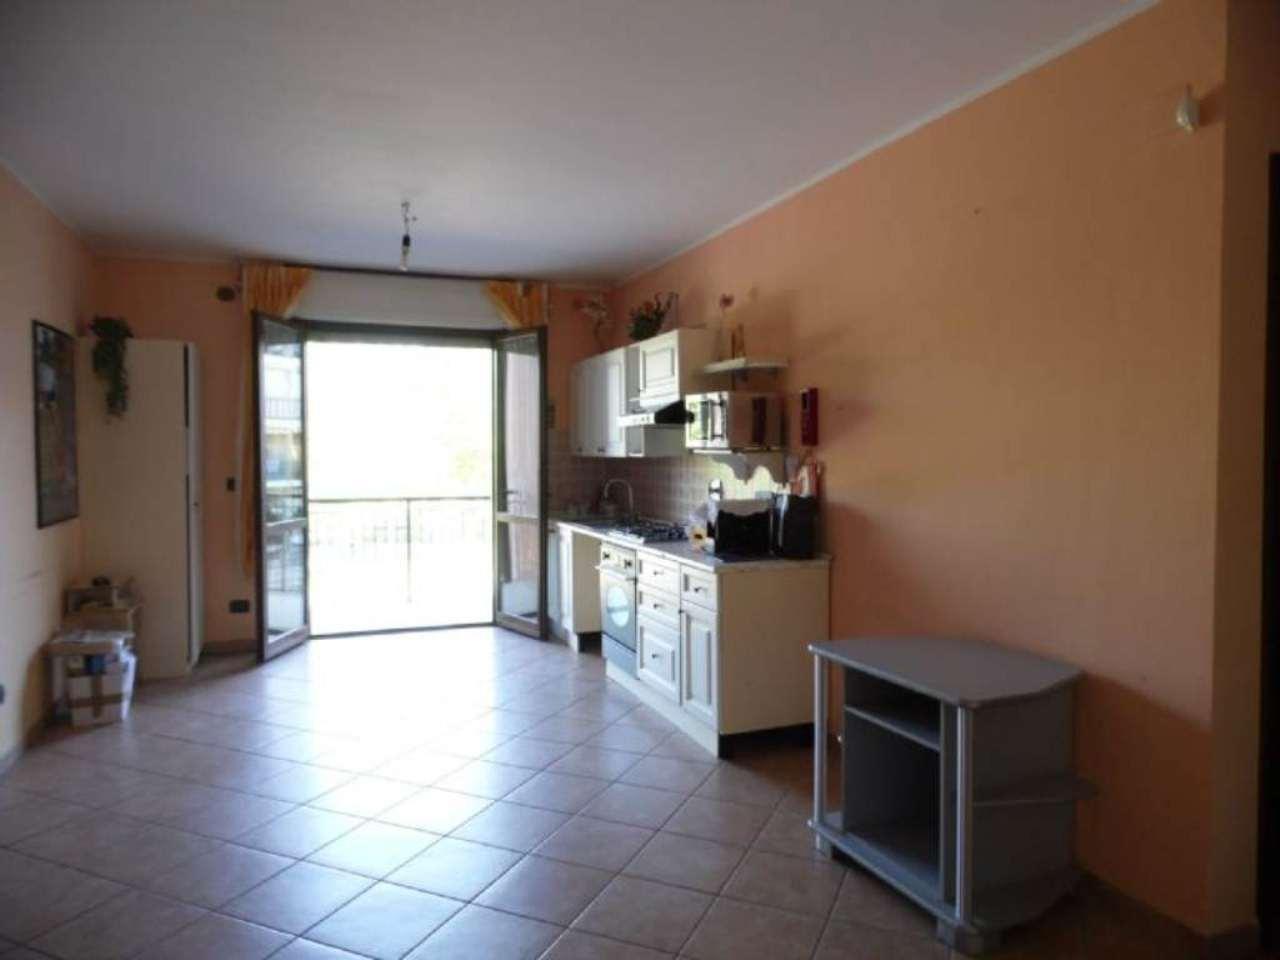 Bilocale Borgaro Torinese Via Settimo 4